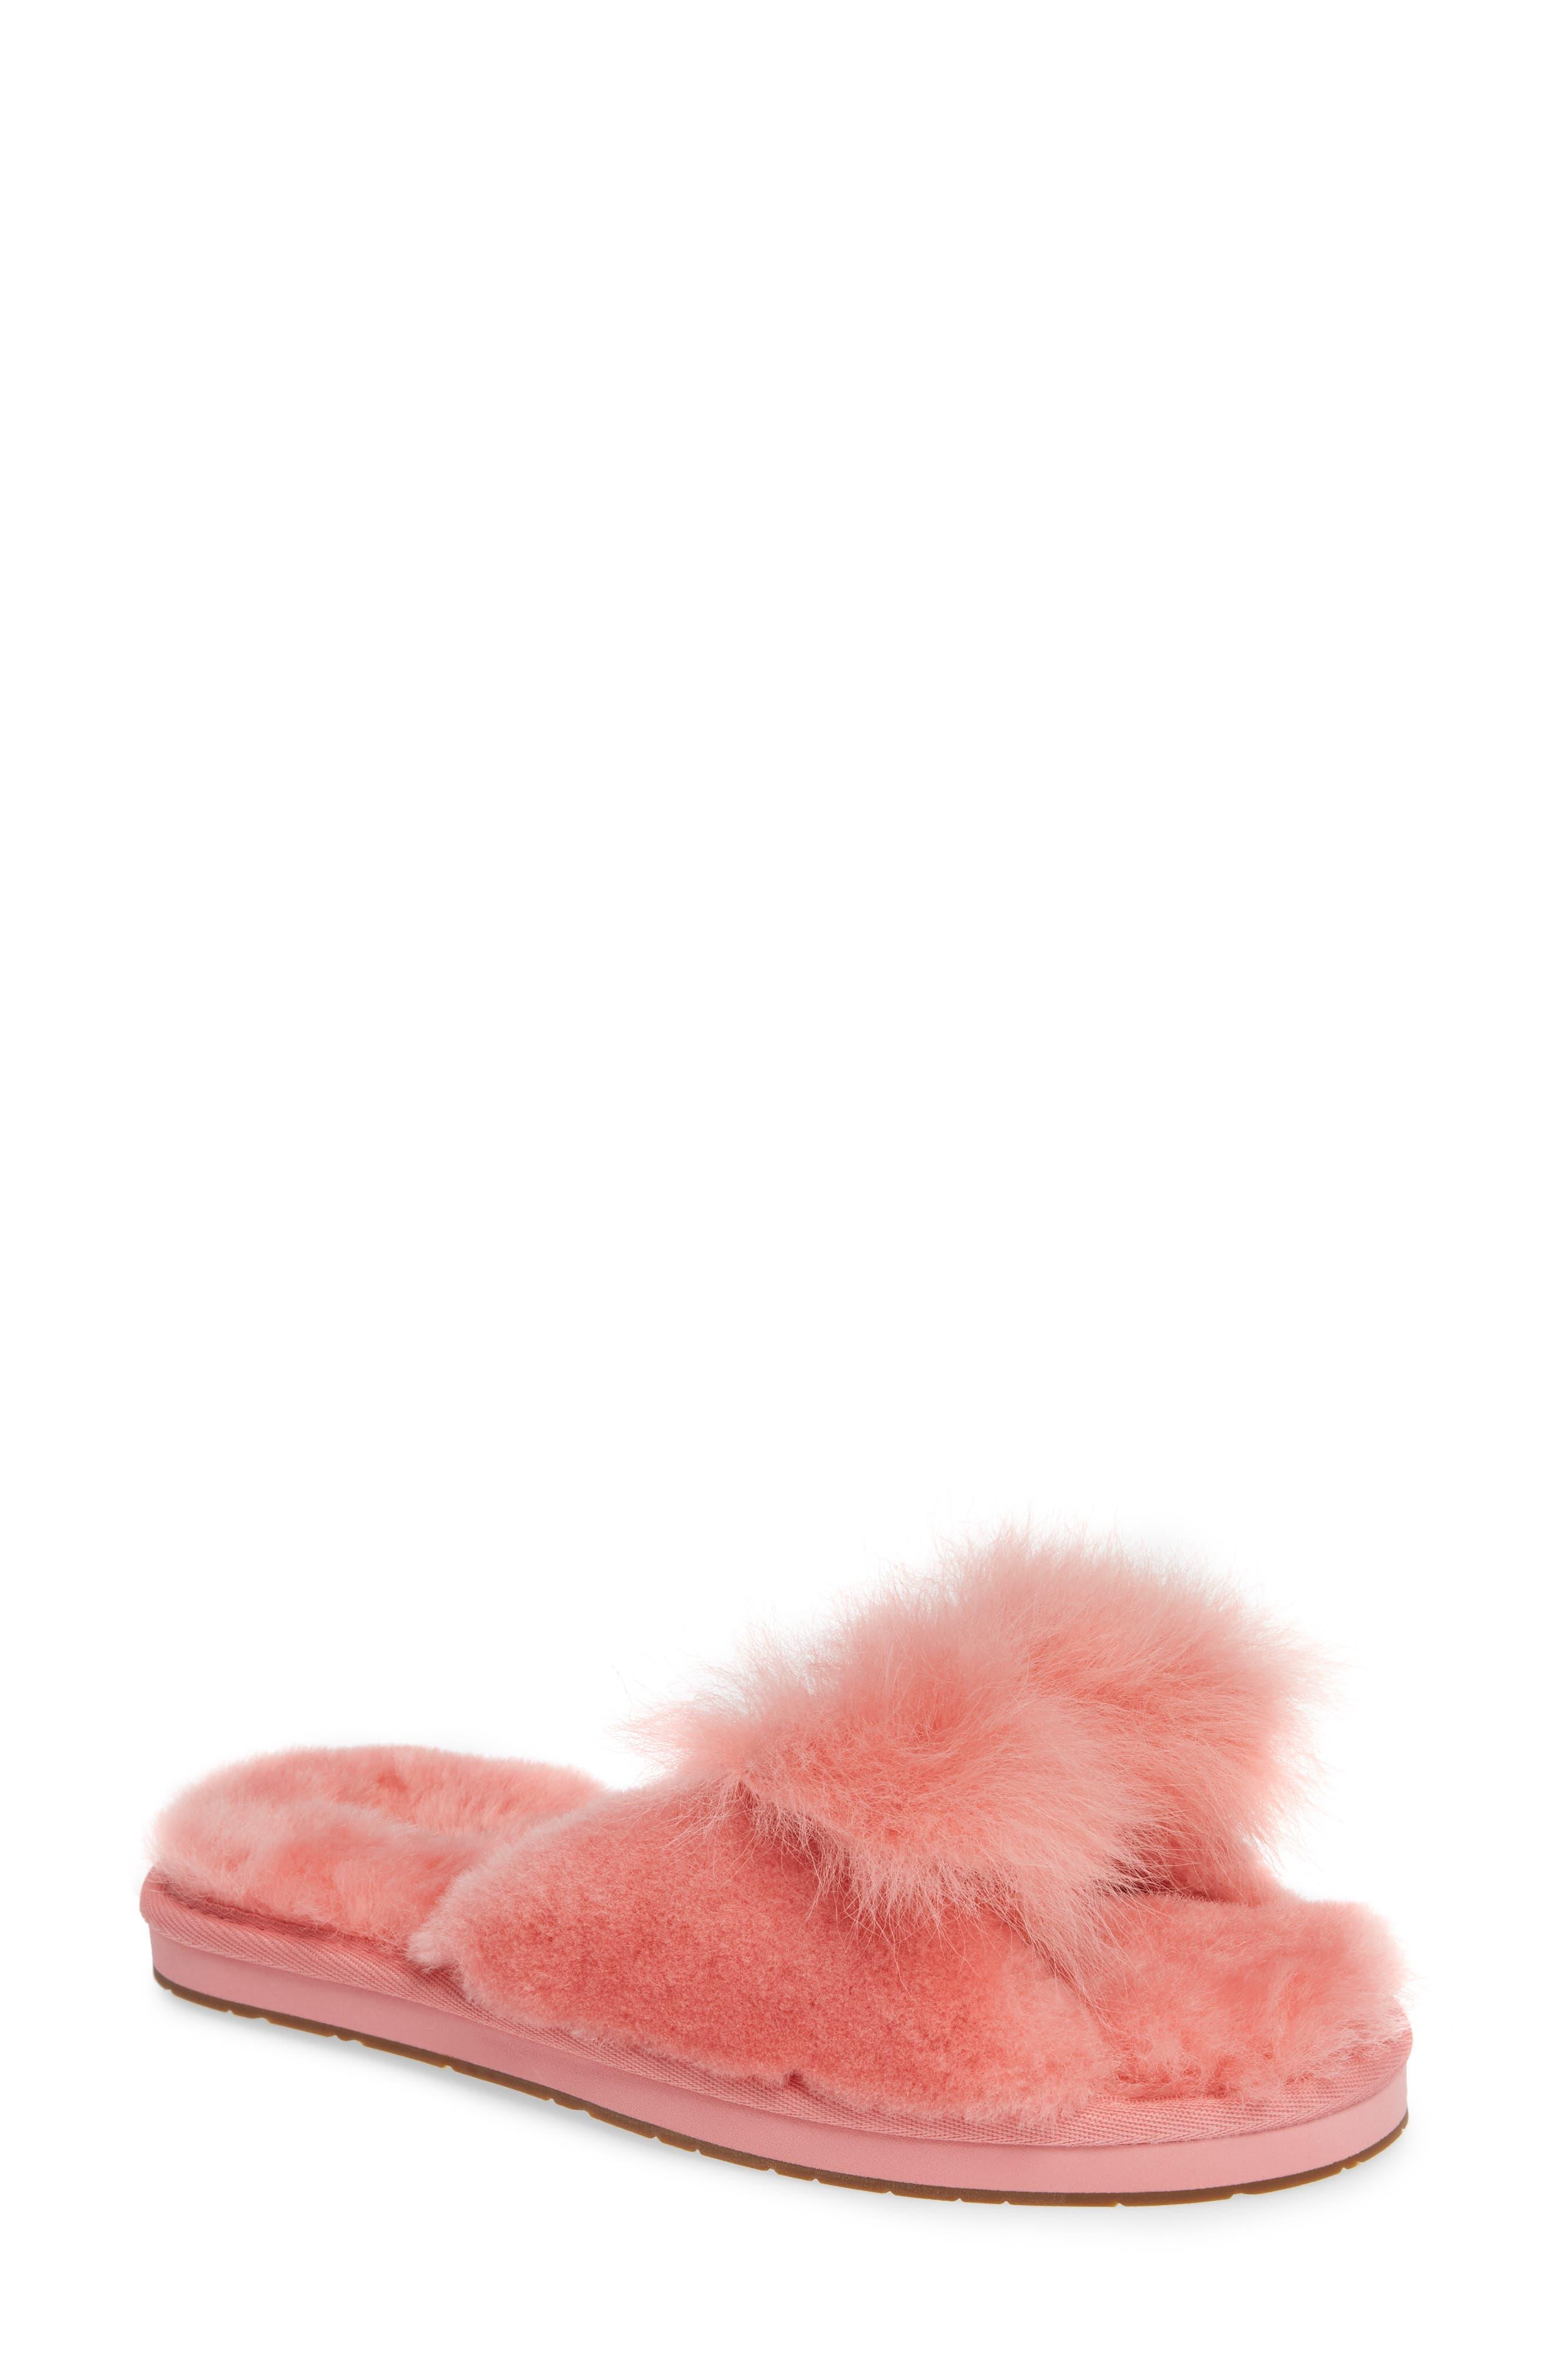 Ugg Mirabelle Genuine Shearling Slipper, Pink